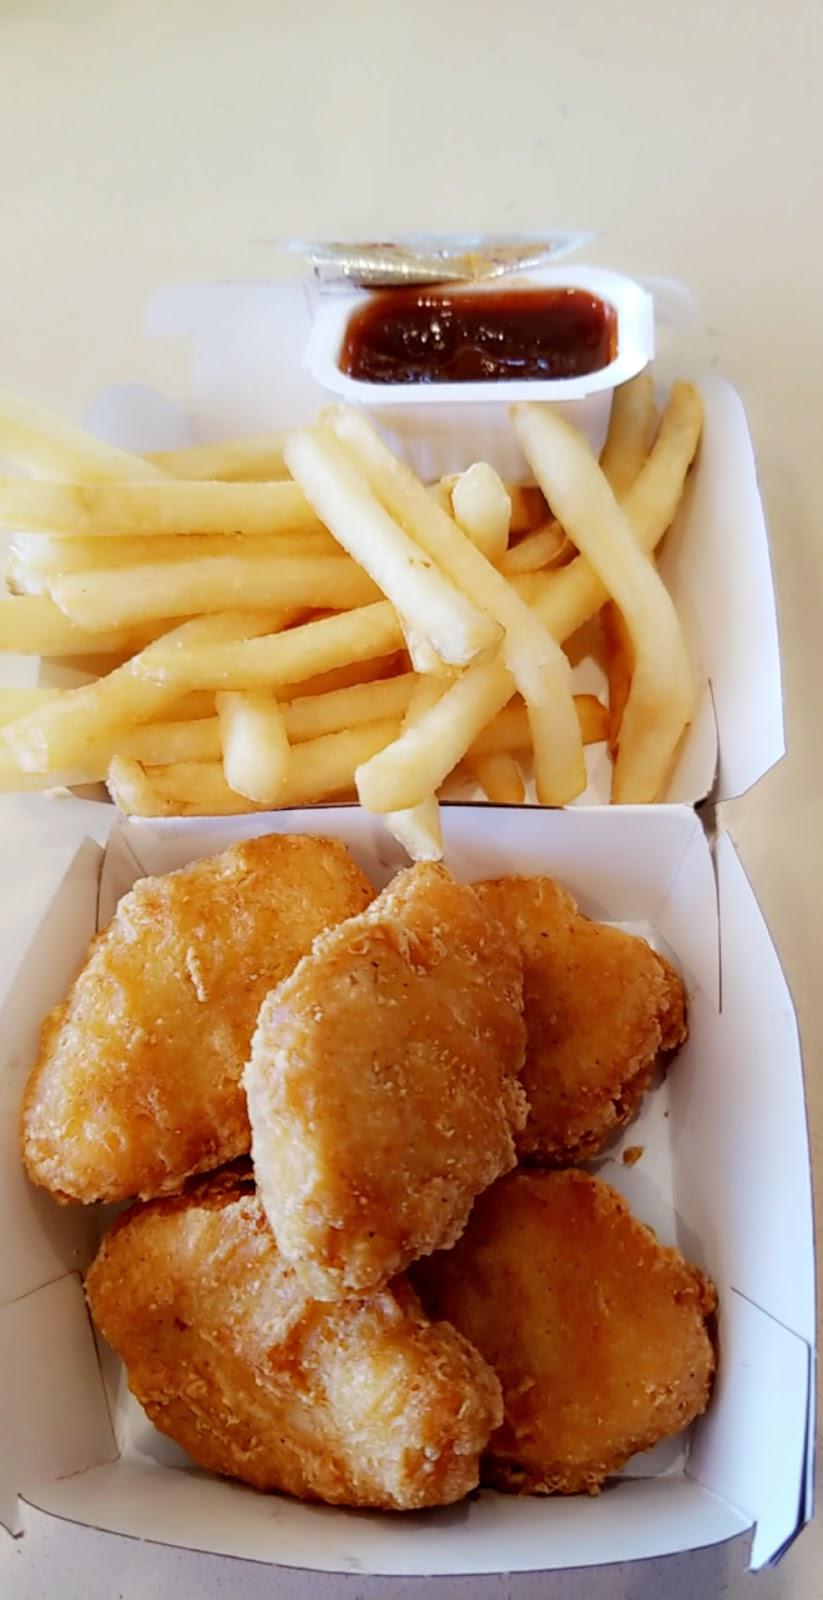 McDonalds - cafe  | Photo 8 of 10 | Address: 12801 East Stockton Street, Galt, CA 95632, USA | Phone: (209) 745-2197